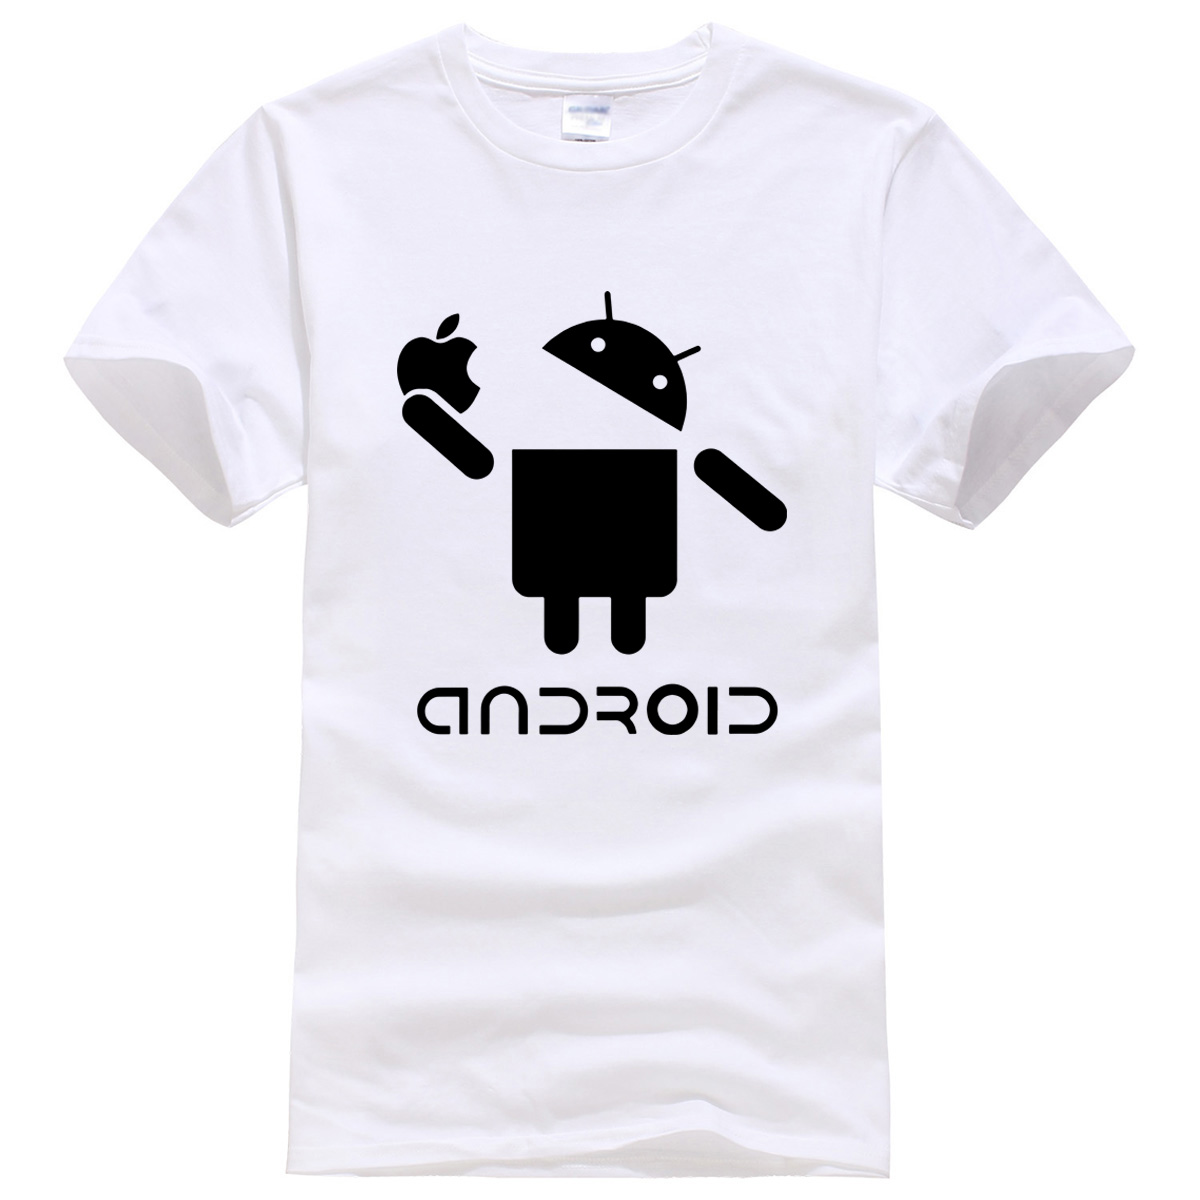 Android character pattern summer 2019   T  -  shirt   cotton new hot sale men's   T  -  shirts   fashion casual   t     shirt   harajuku crossfit brand